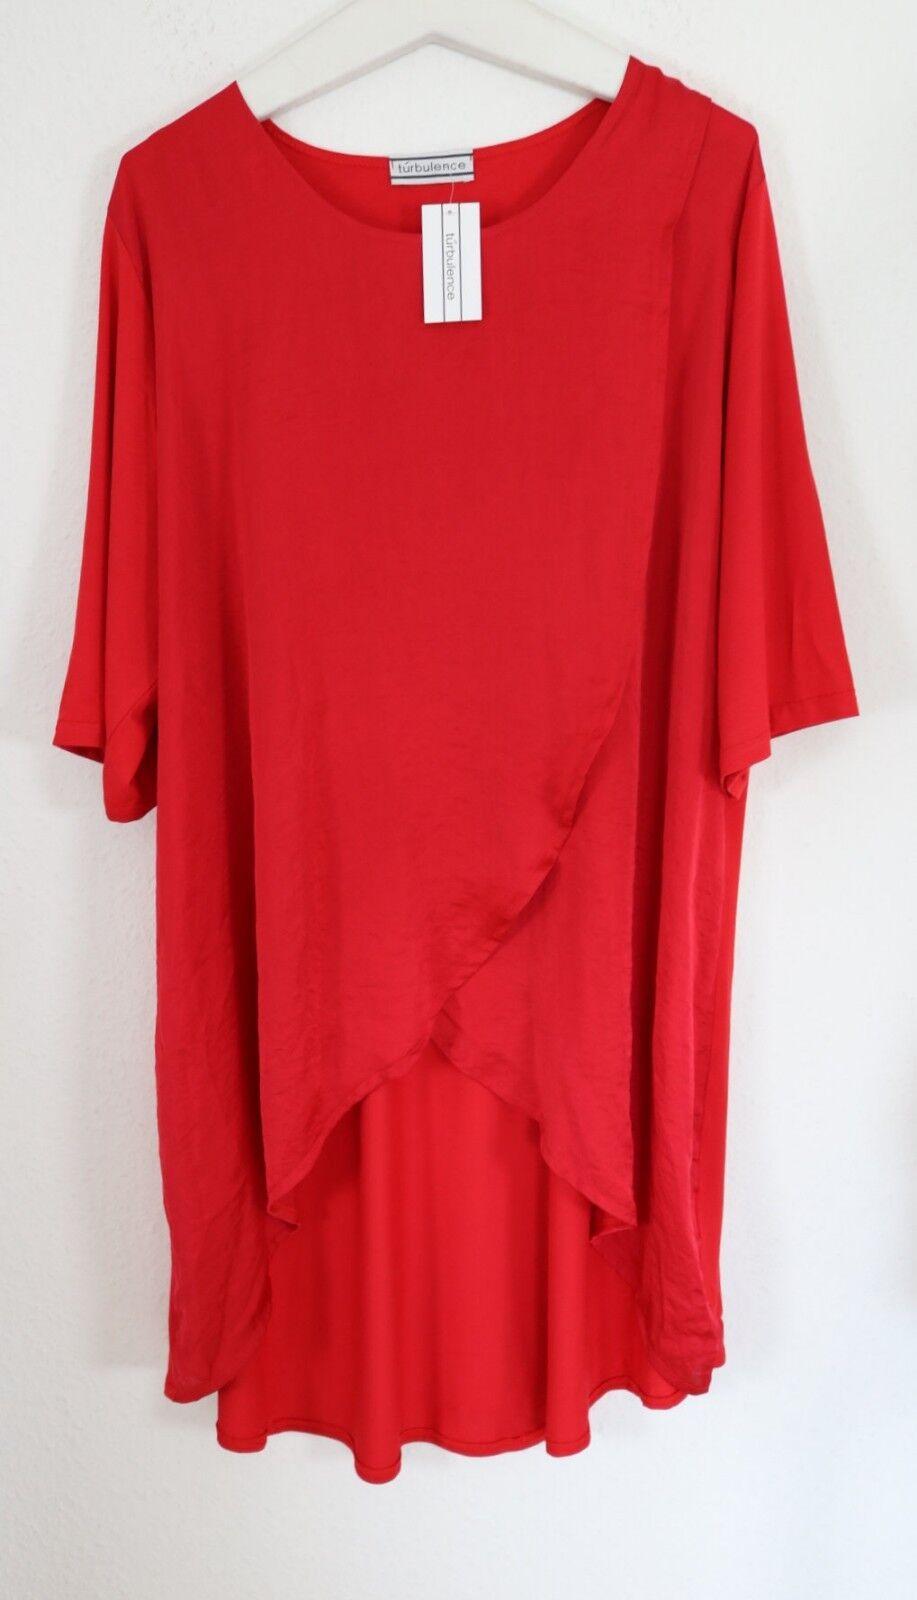 Turbulence LAGENLOOK Luxus Basic Tunika Kleid 52 54 XXL mit Satin NEU